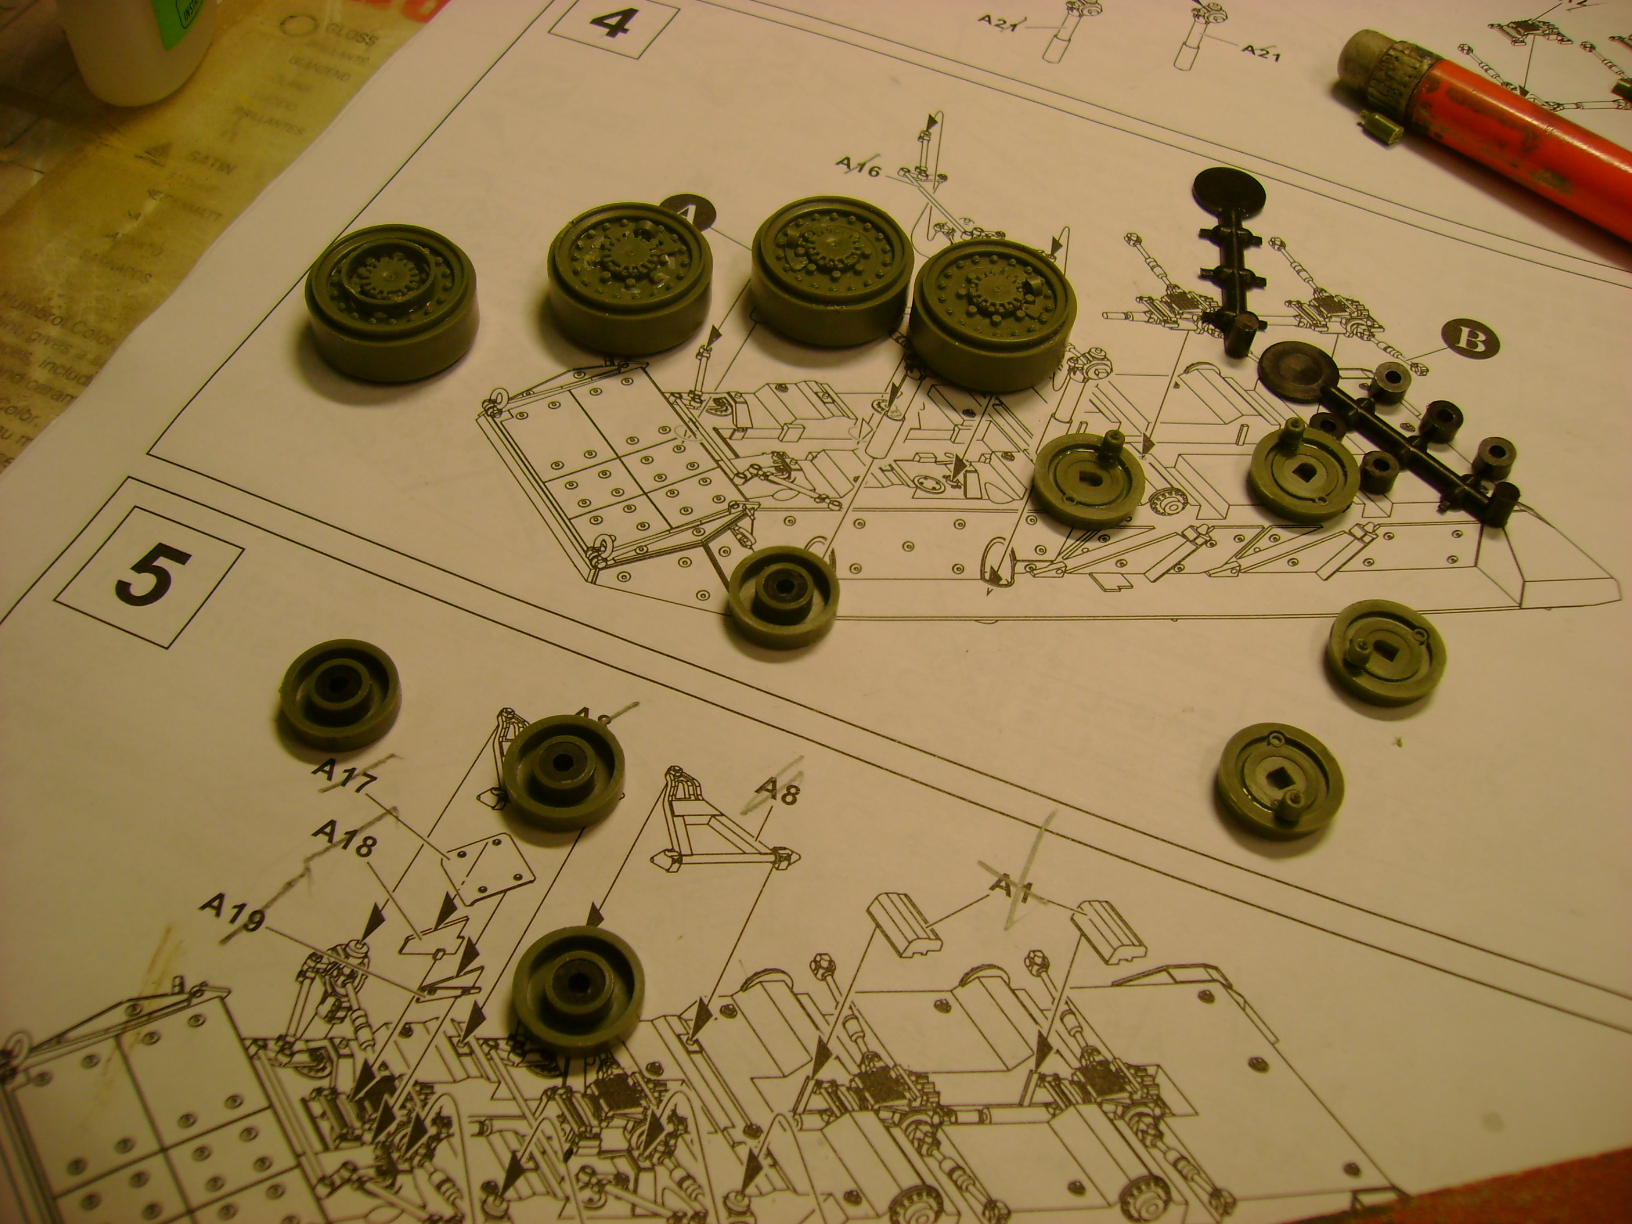 Stryker M1128 MGS Terminé.... - Page 2 Dsc00500v